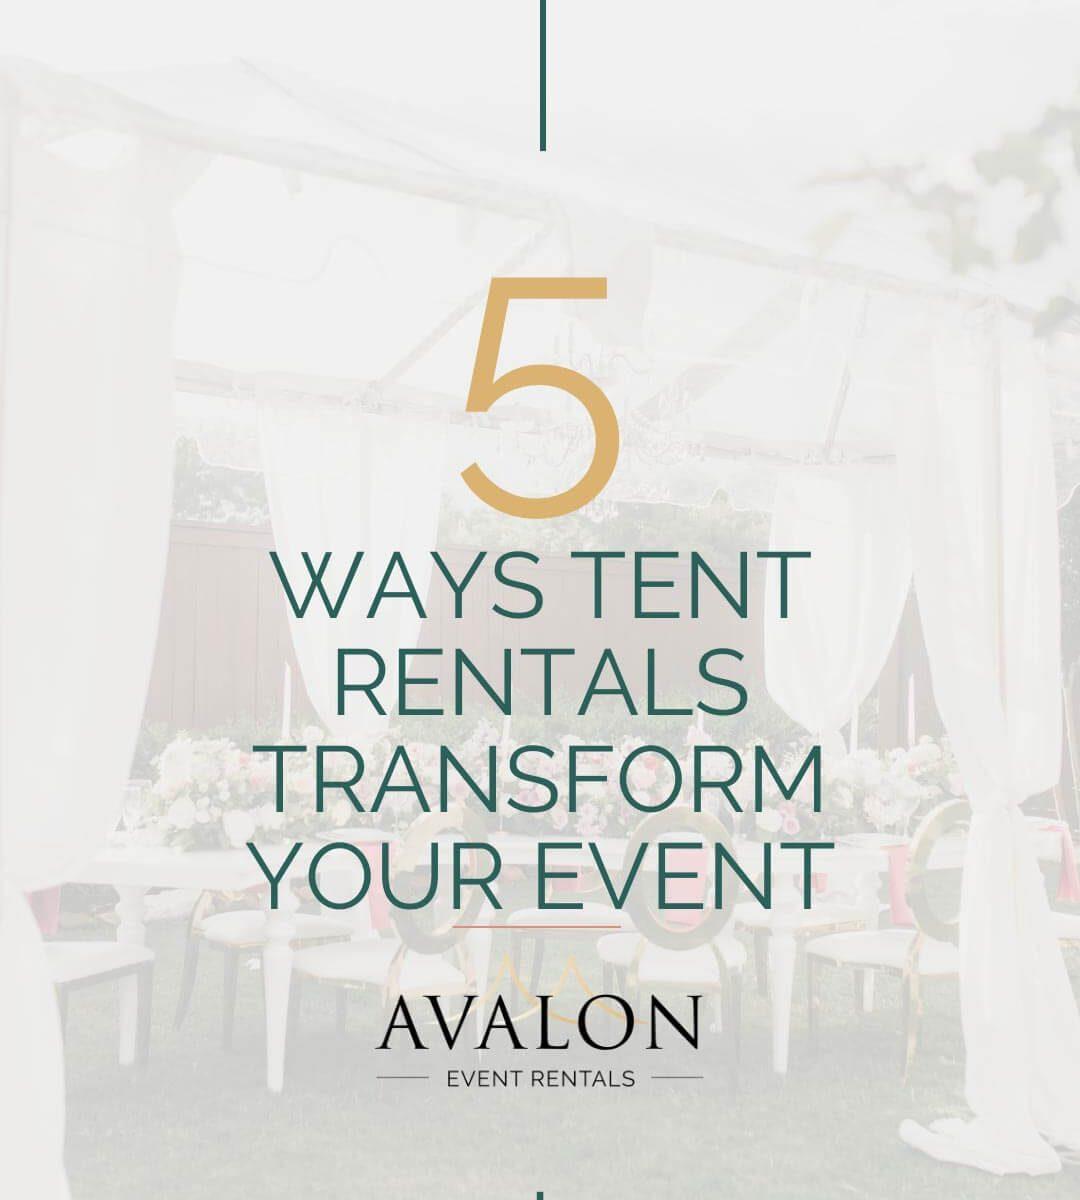 5-Ways-Tent-Rentals-Transform-Your-Event_Avalon-Event-Rentals_blog